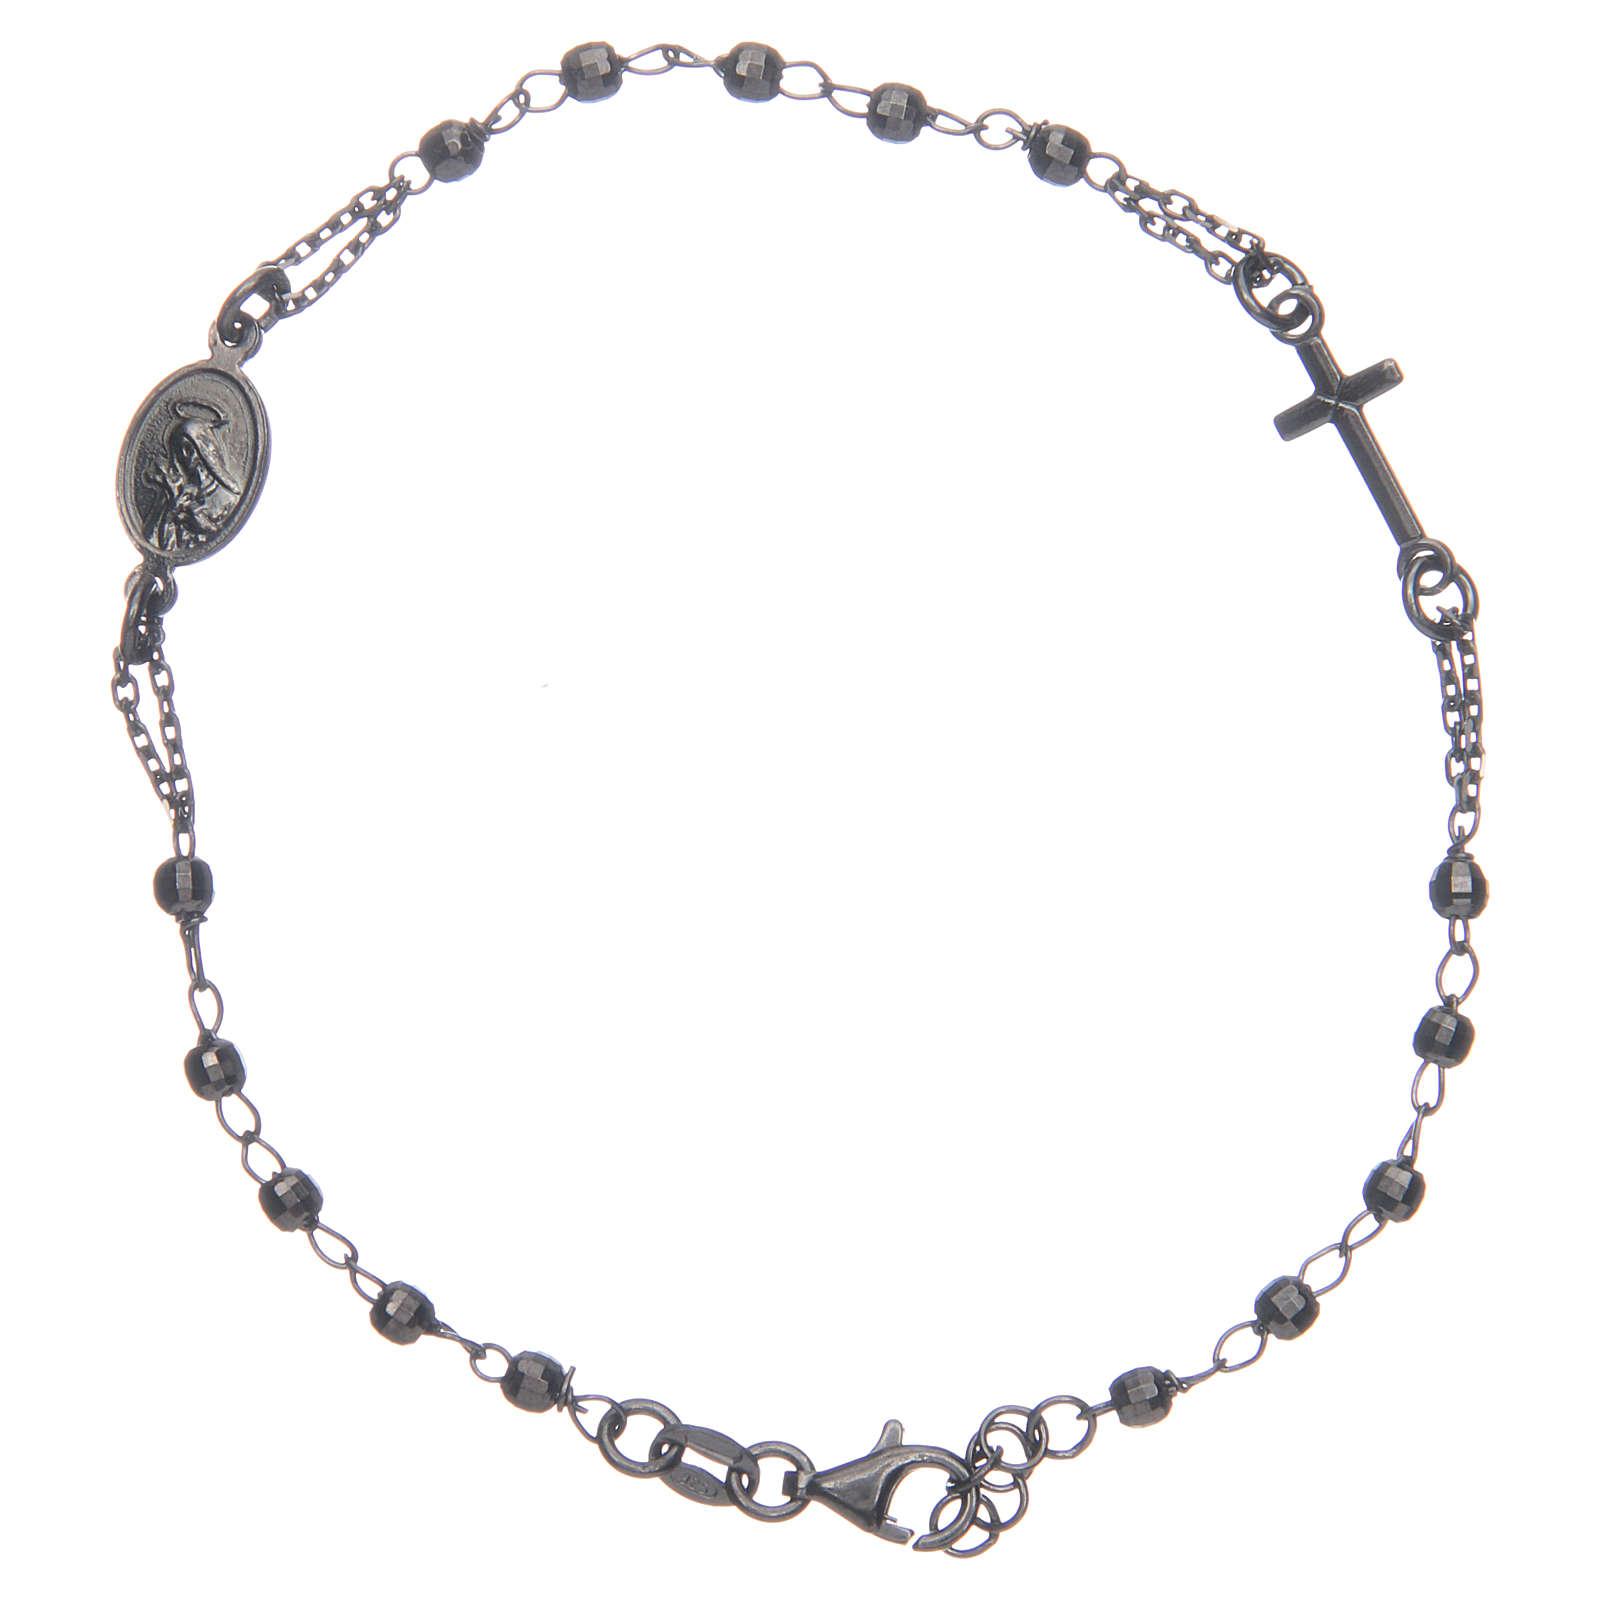 Bracciale rosario nero fumé Santa Rita argento 925 4